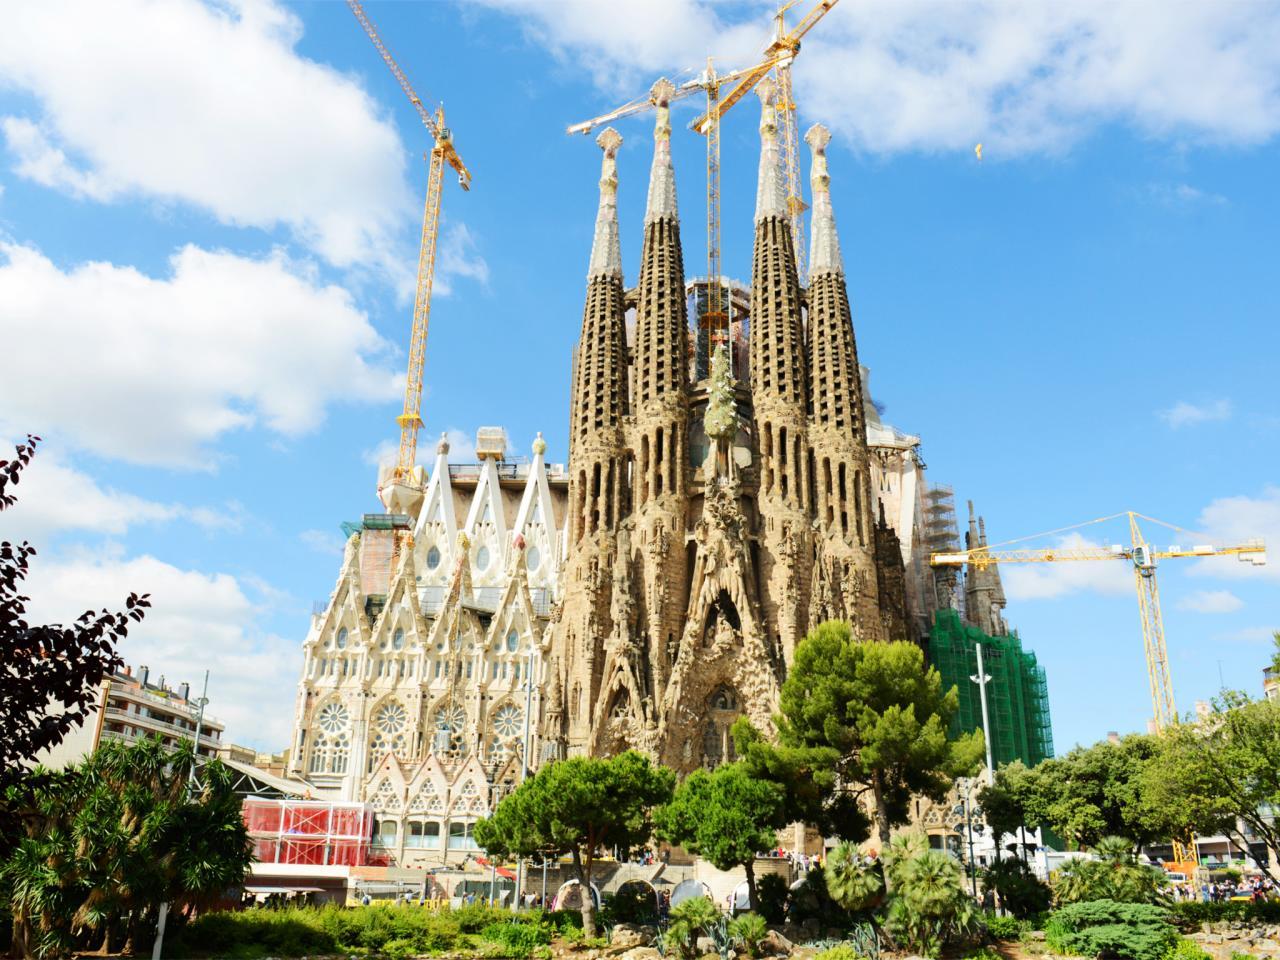 sagrada-familia-architecture-barcelona-spain.jpg.rend.tccom.1280.960